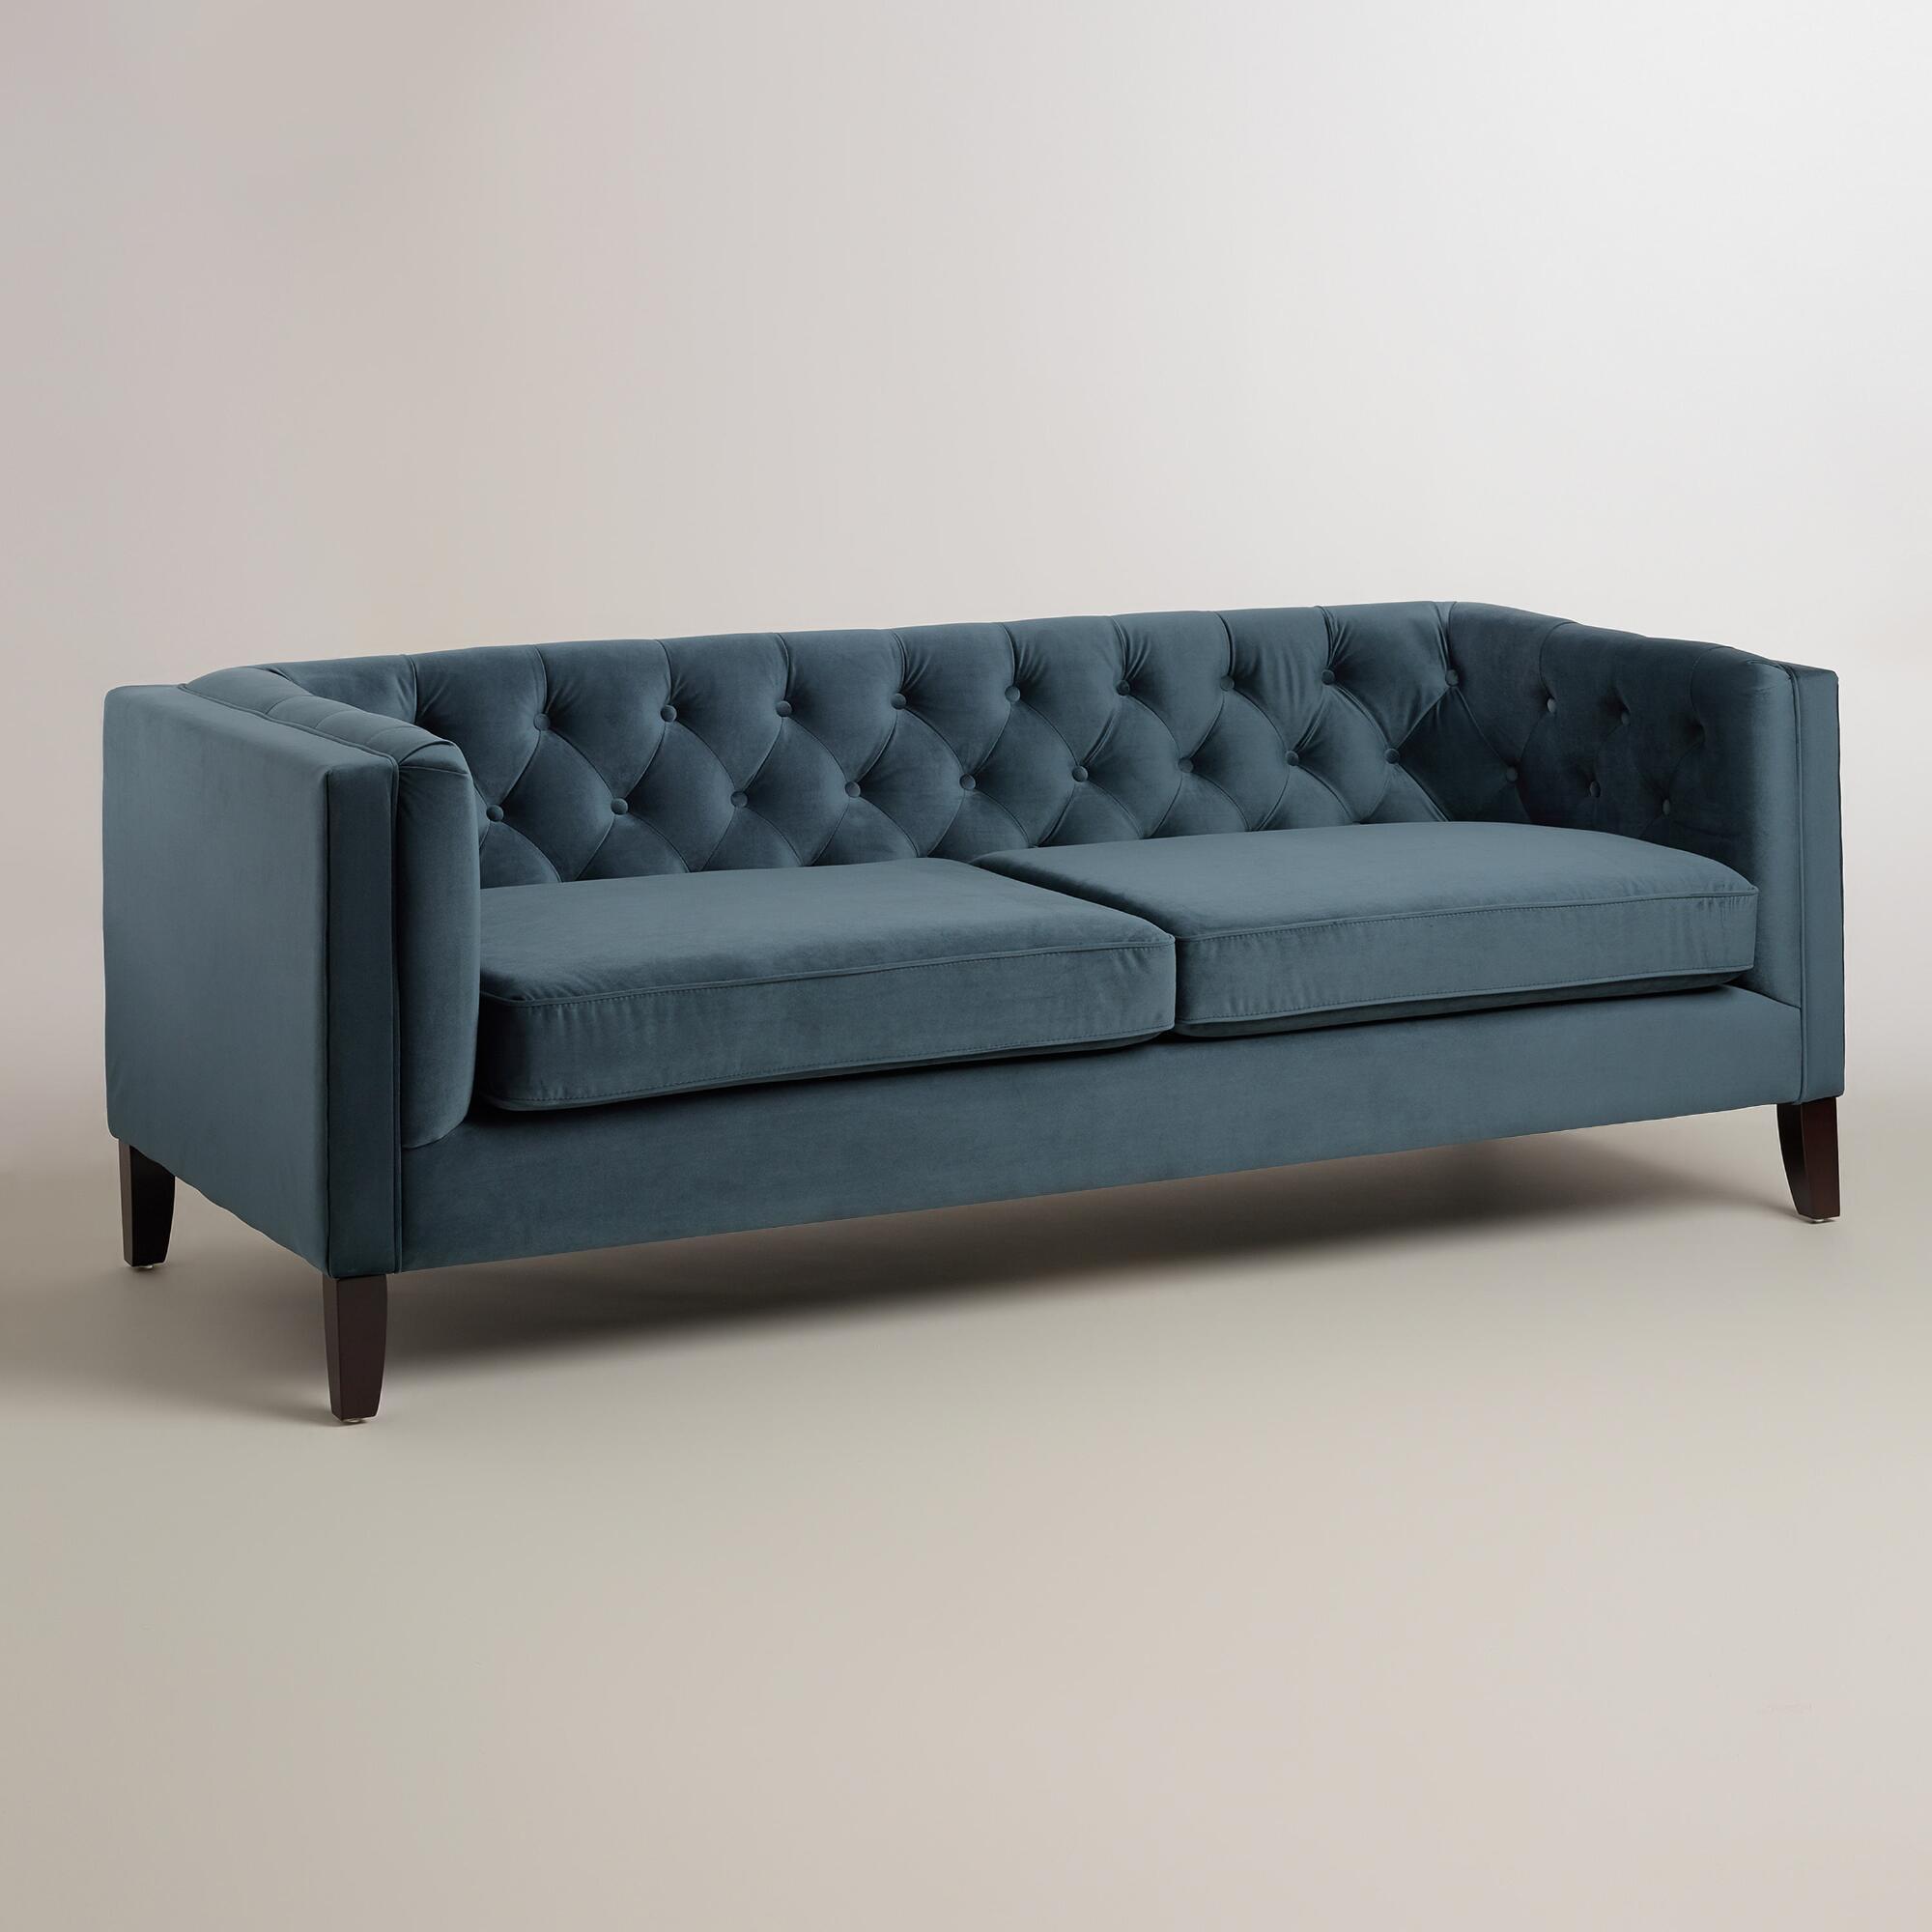 Midnight Velvet Sofa | ON SALE $524.99